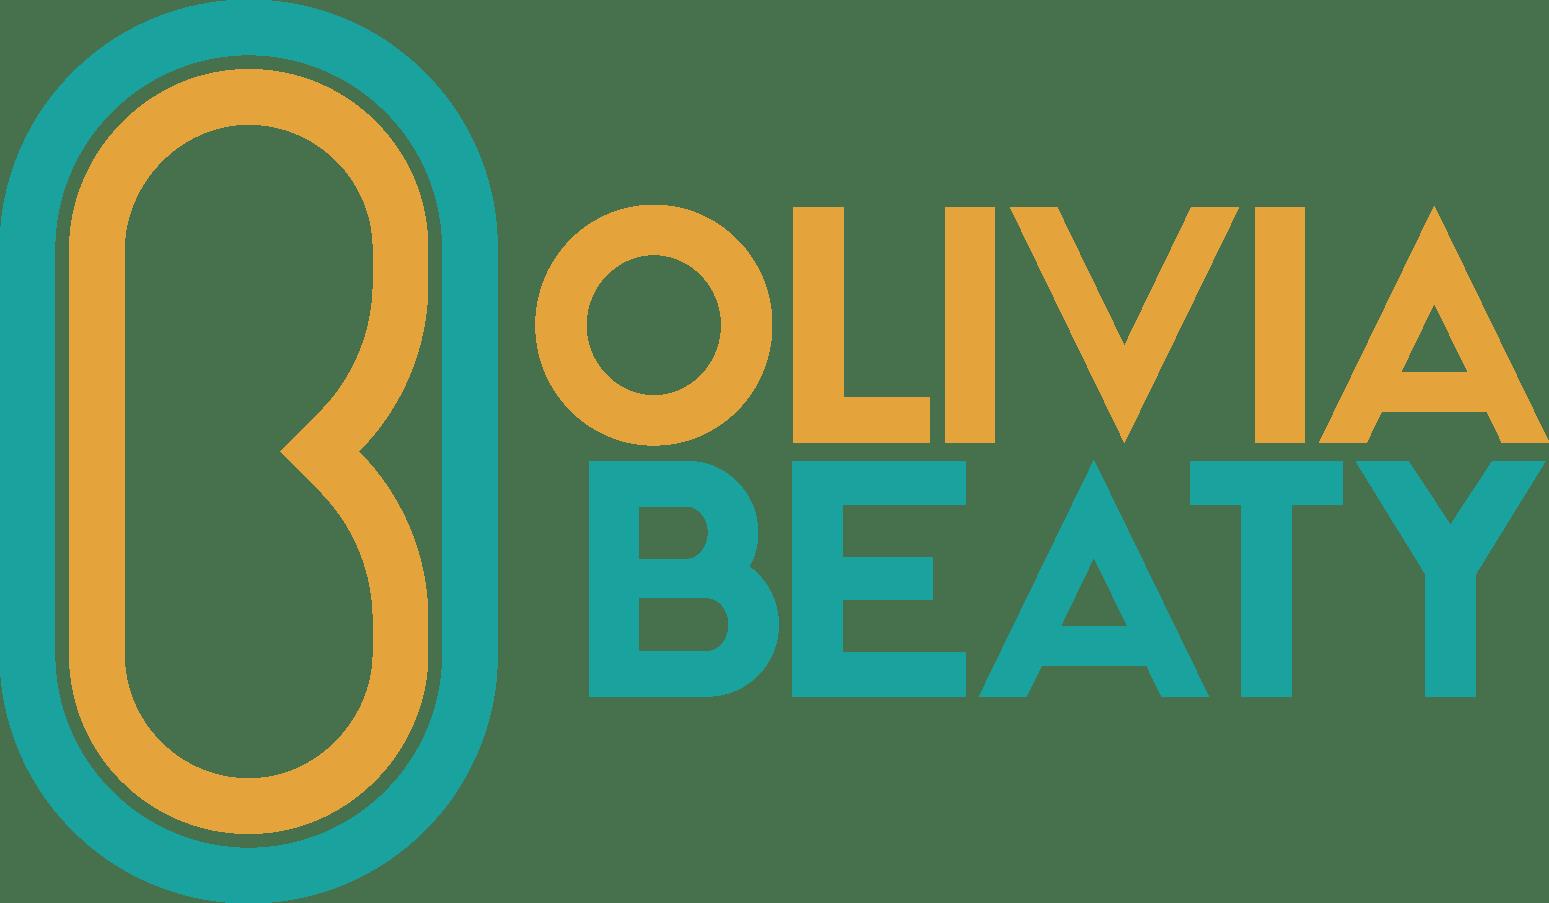 OBeaty Design